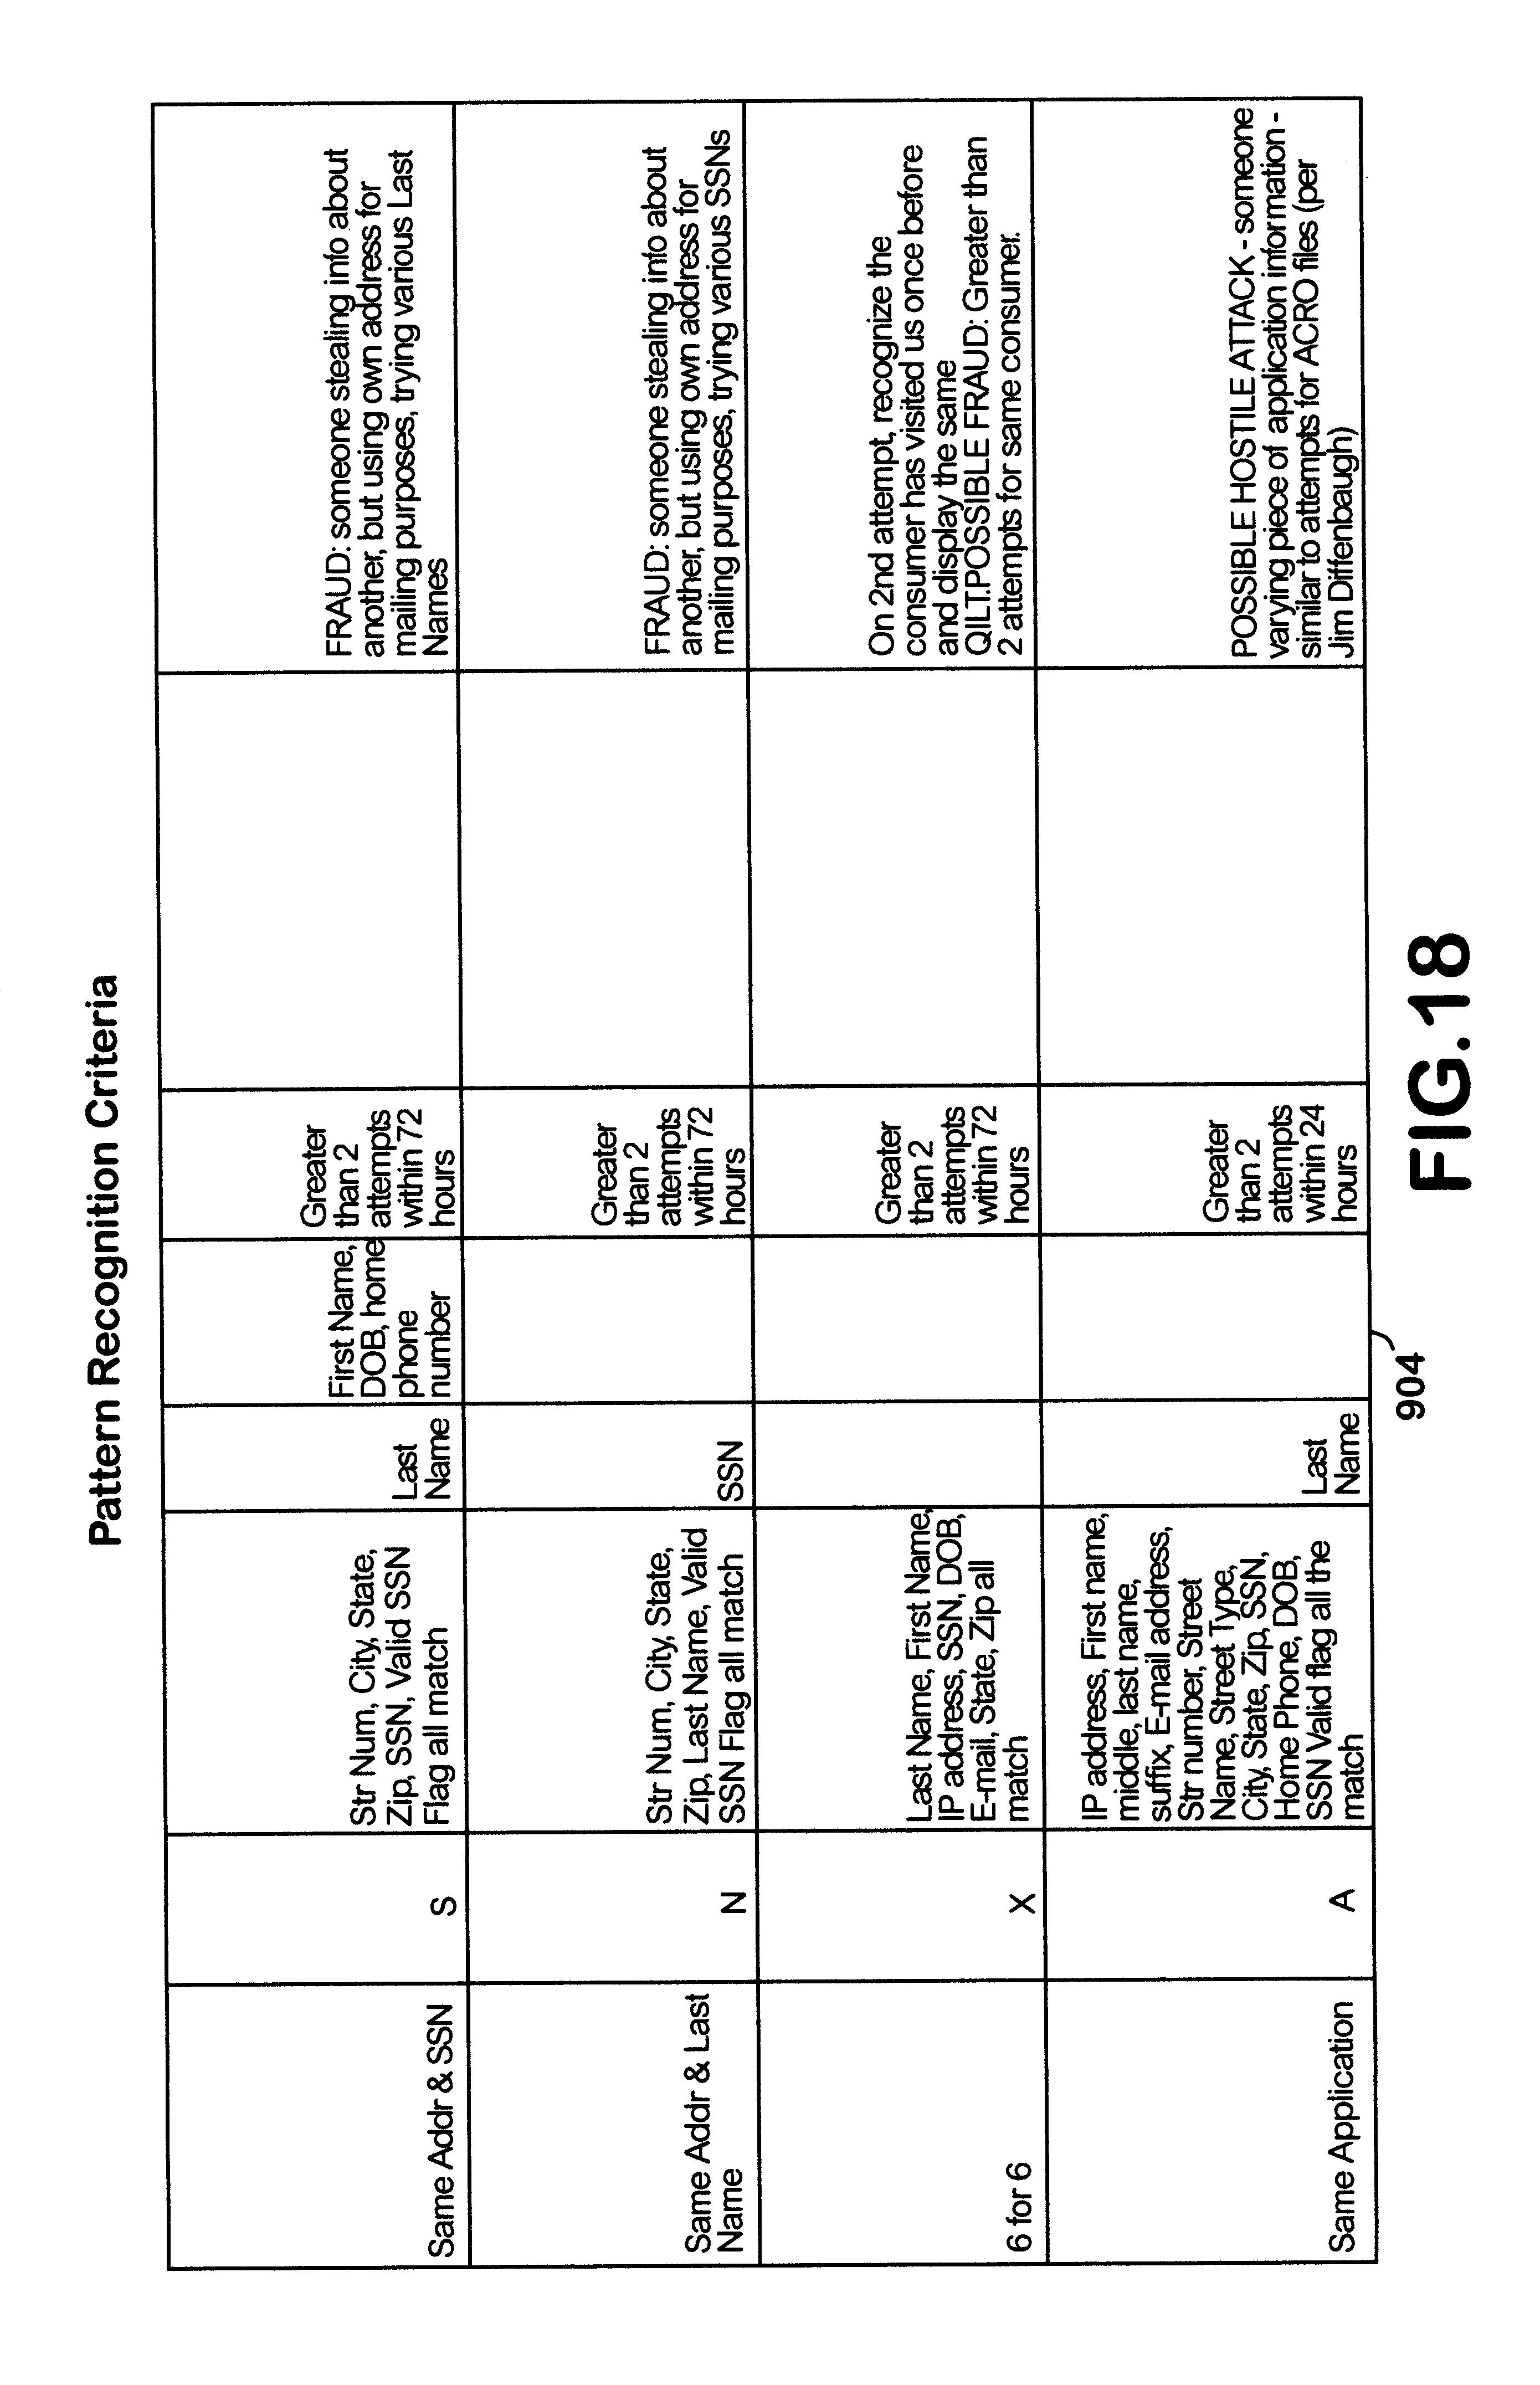 Patent US 6,282,658 B2